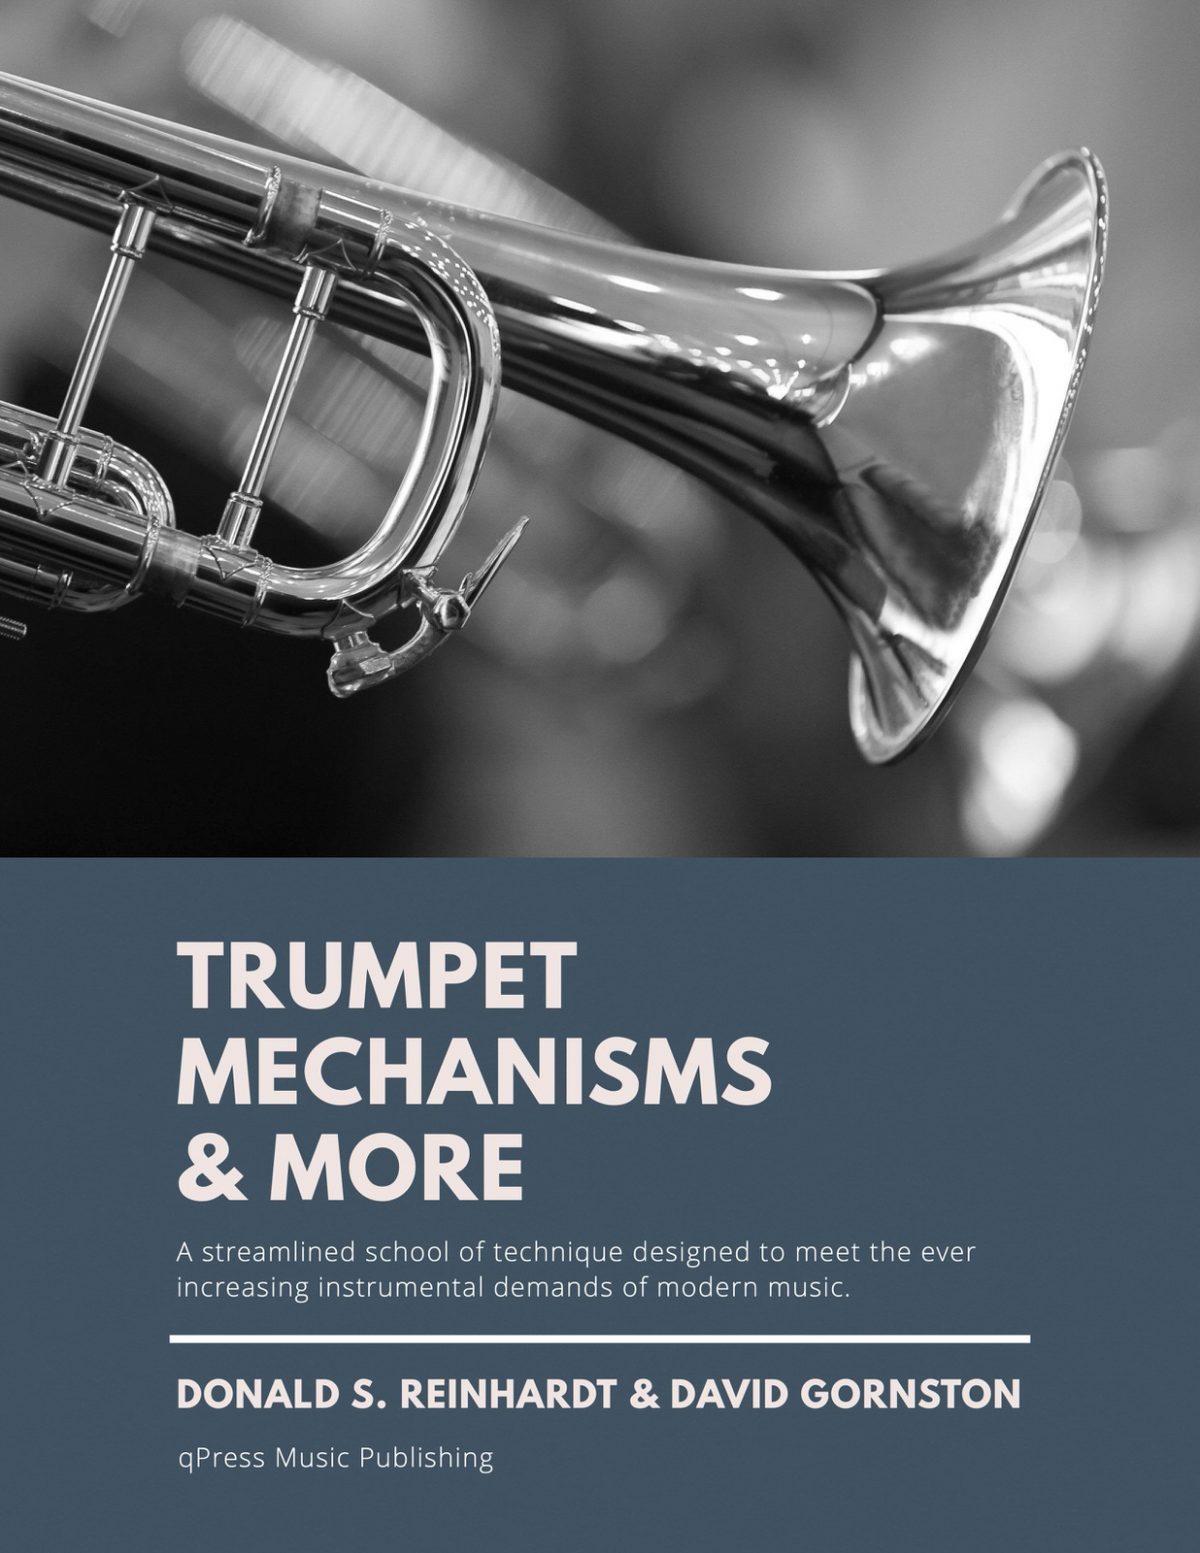 RichWilley-TrumpetMechanisms-Rev003-300-p01